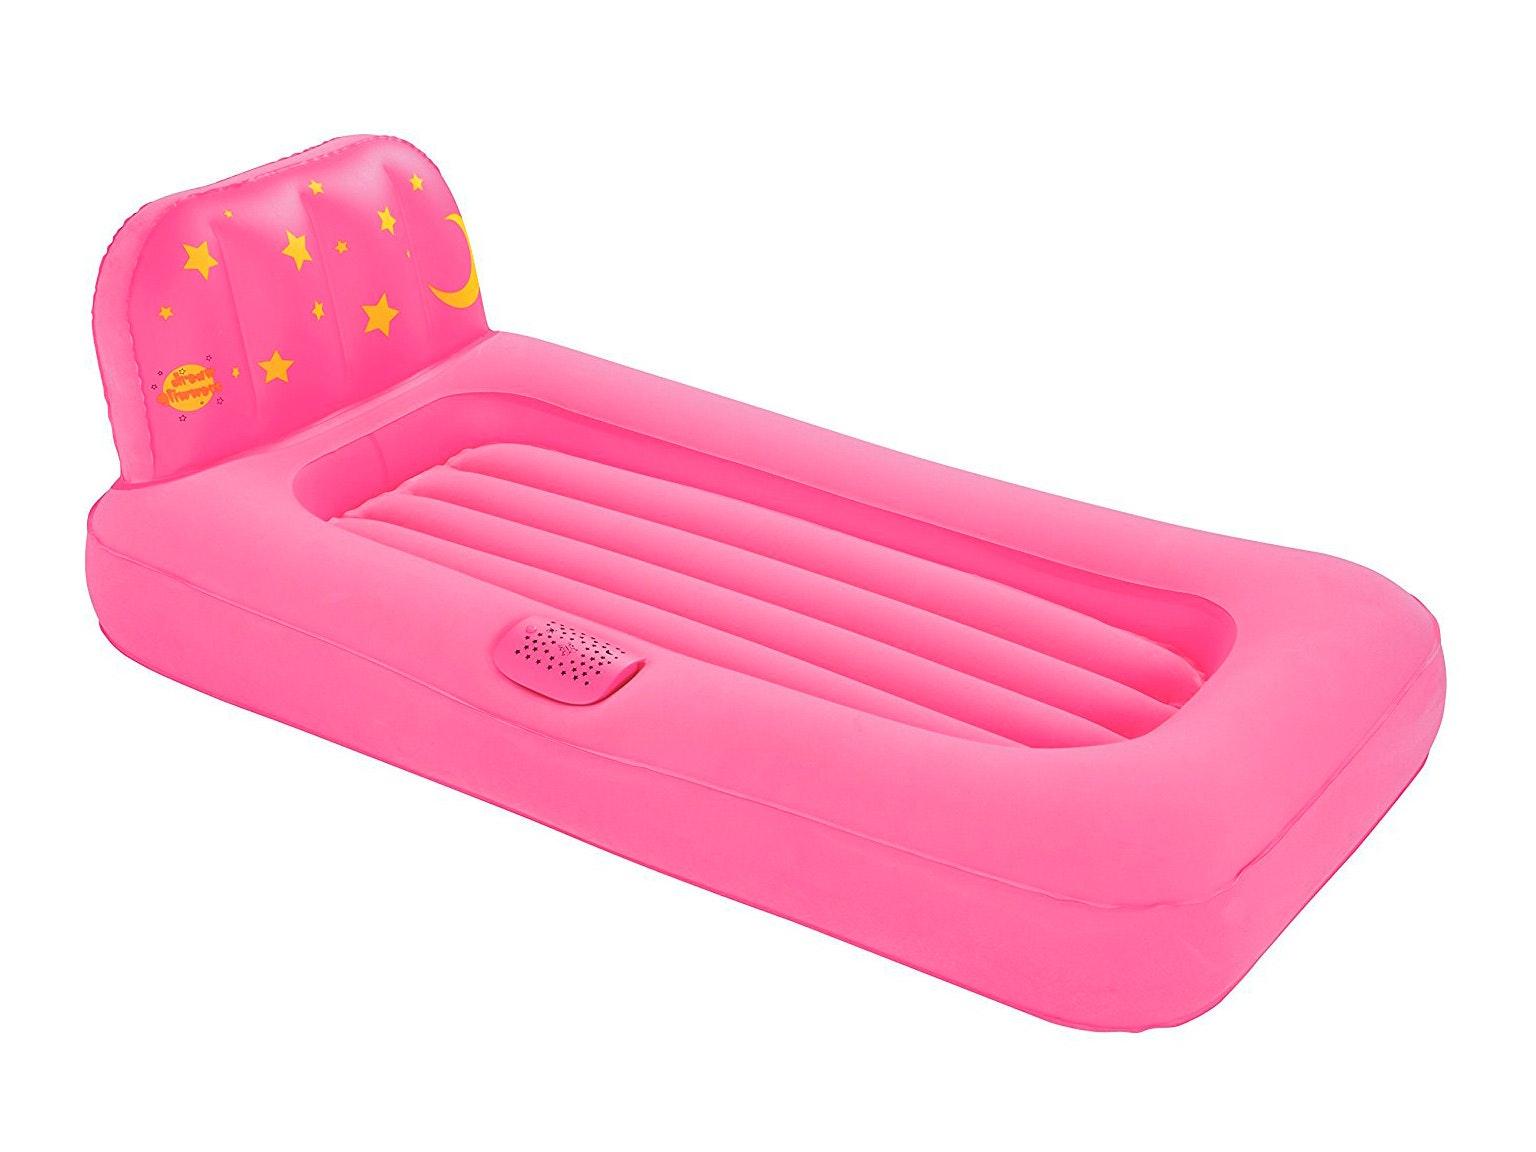 Bestway Dream Glimmers Kids Air Bed Pink